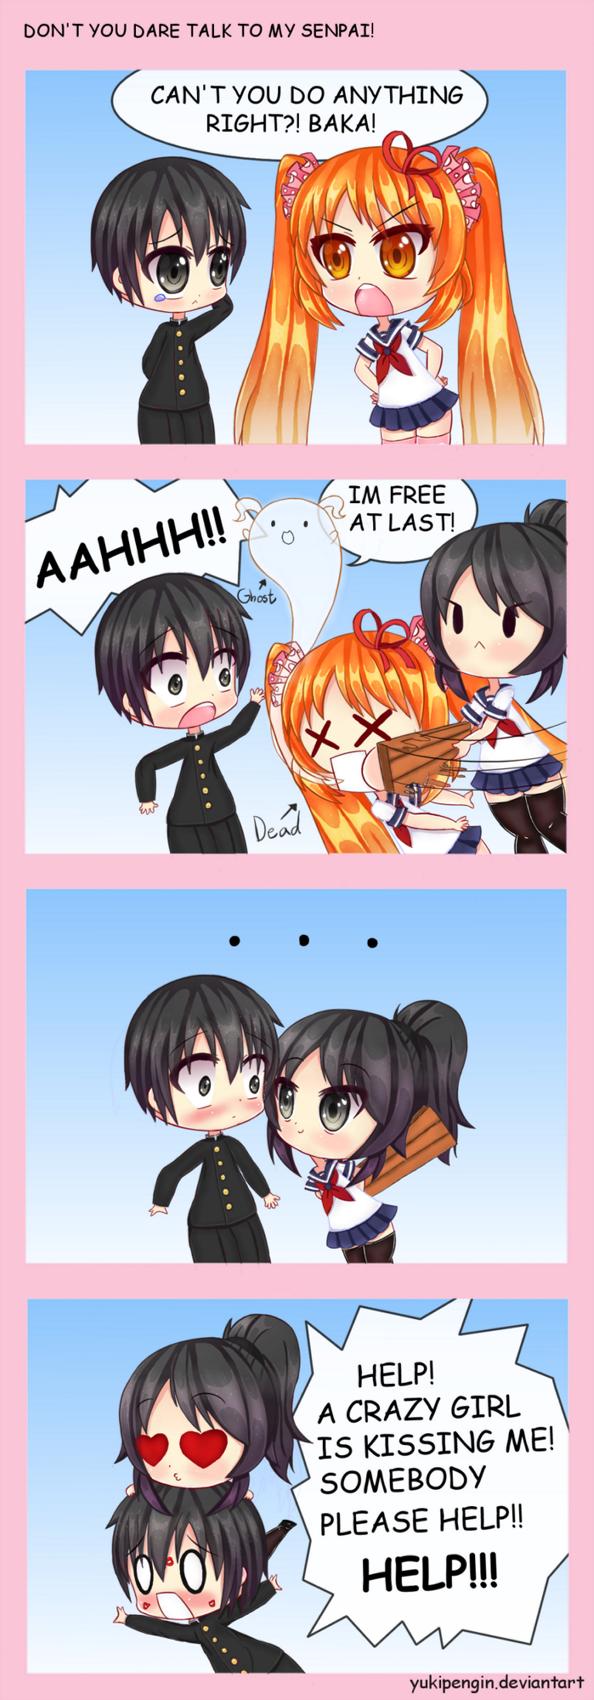 DON'T YOU DARE TALK TO MY SENPAI! by Yukipengin Yandere